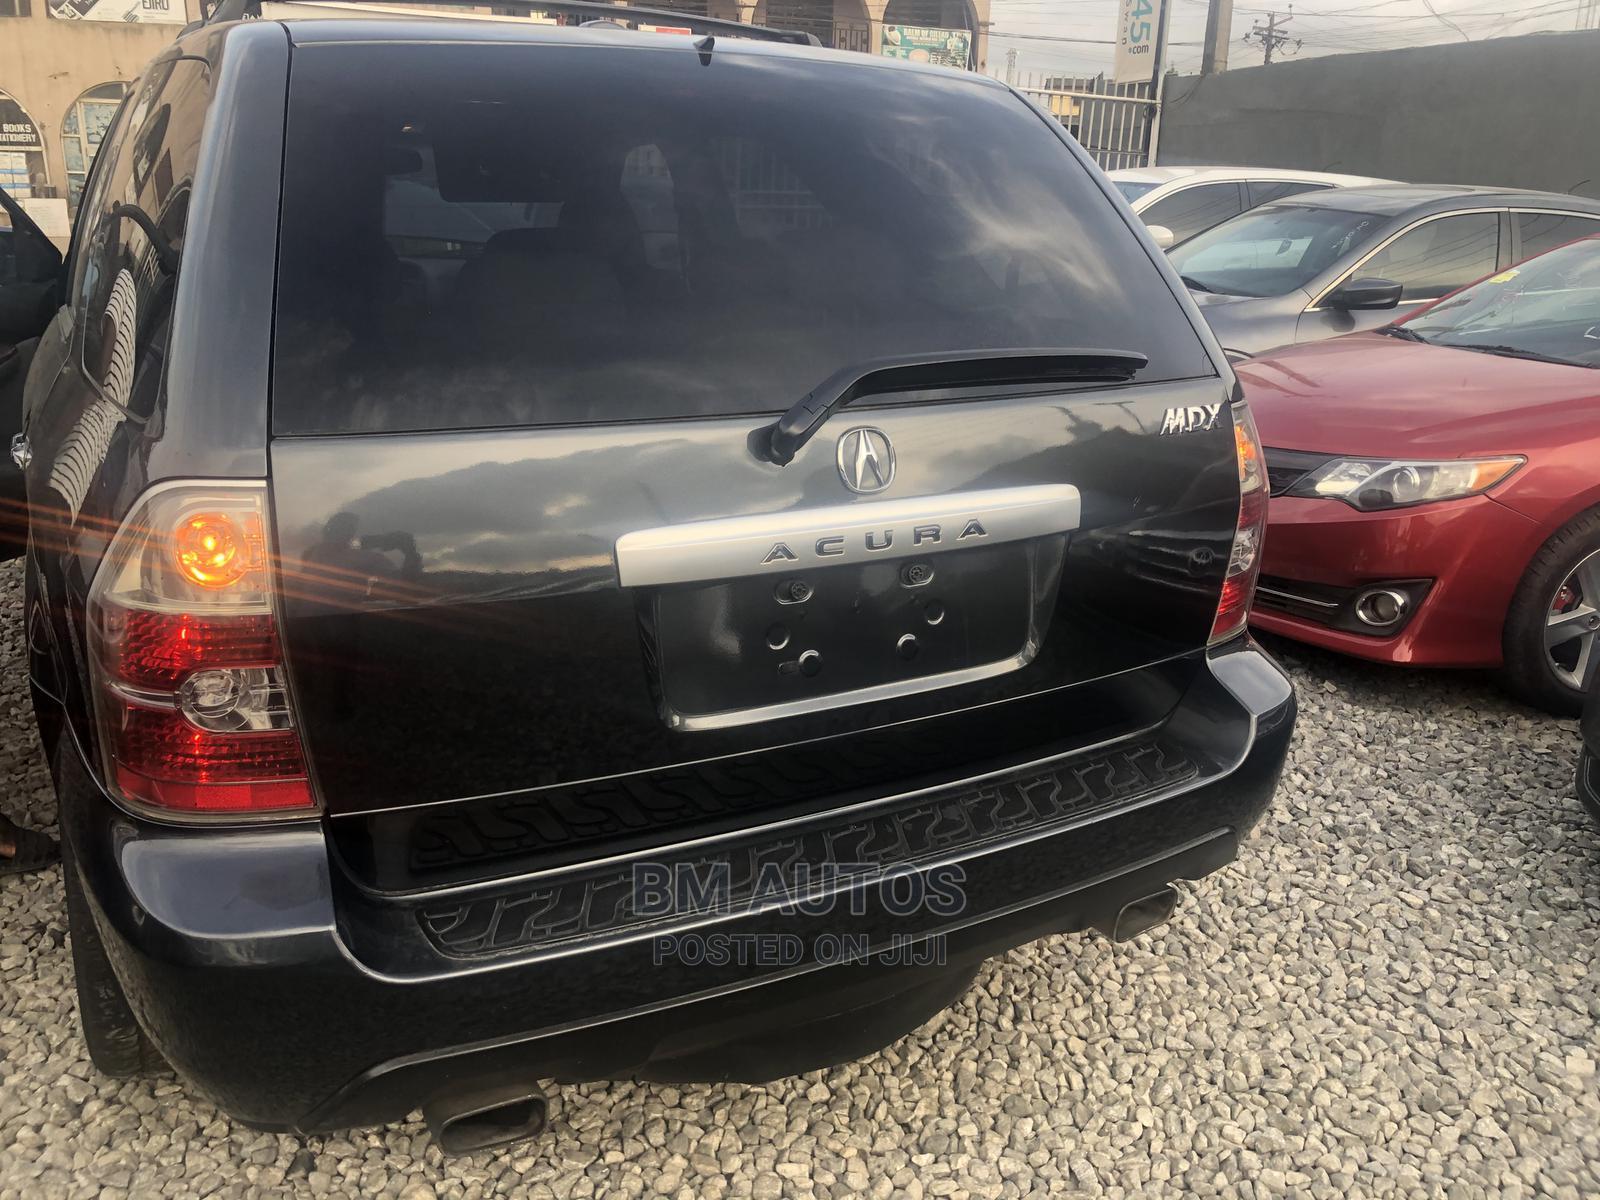 Acura MDX 2006 Gray   Cars for sale in Ifako-Ijaiye, Lagos State, Nigeria